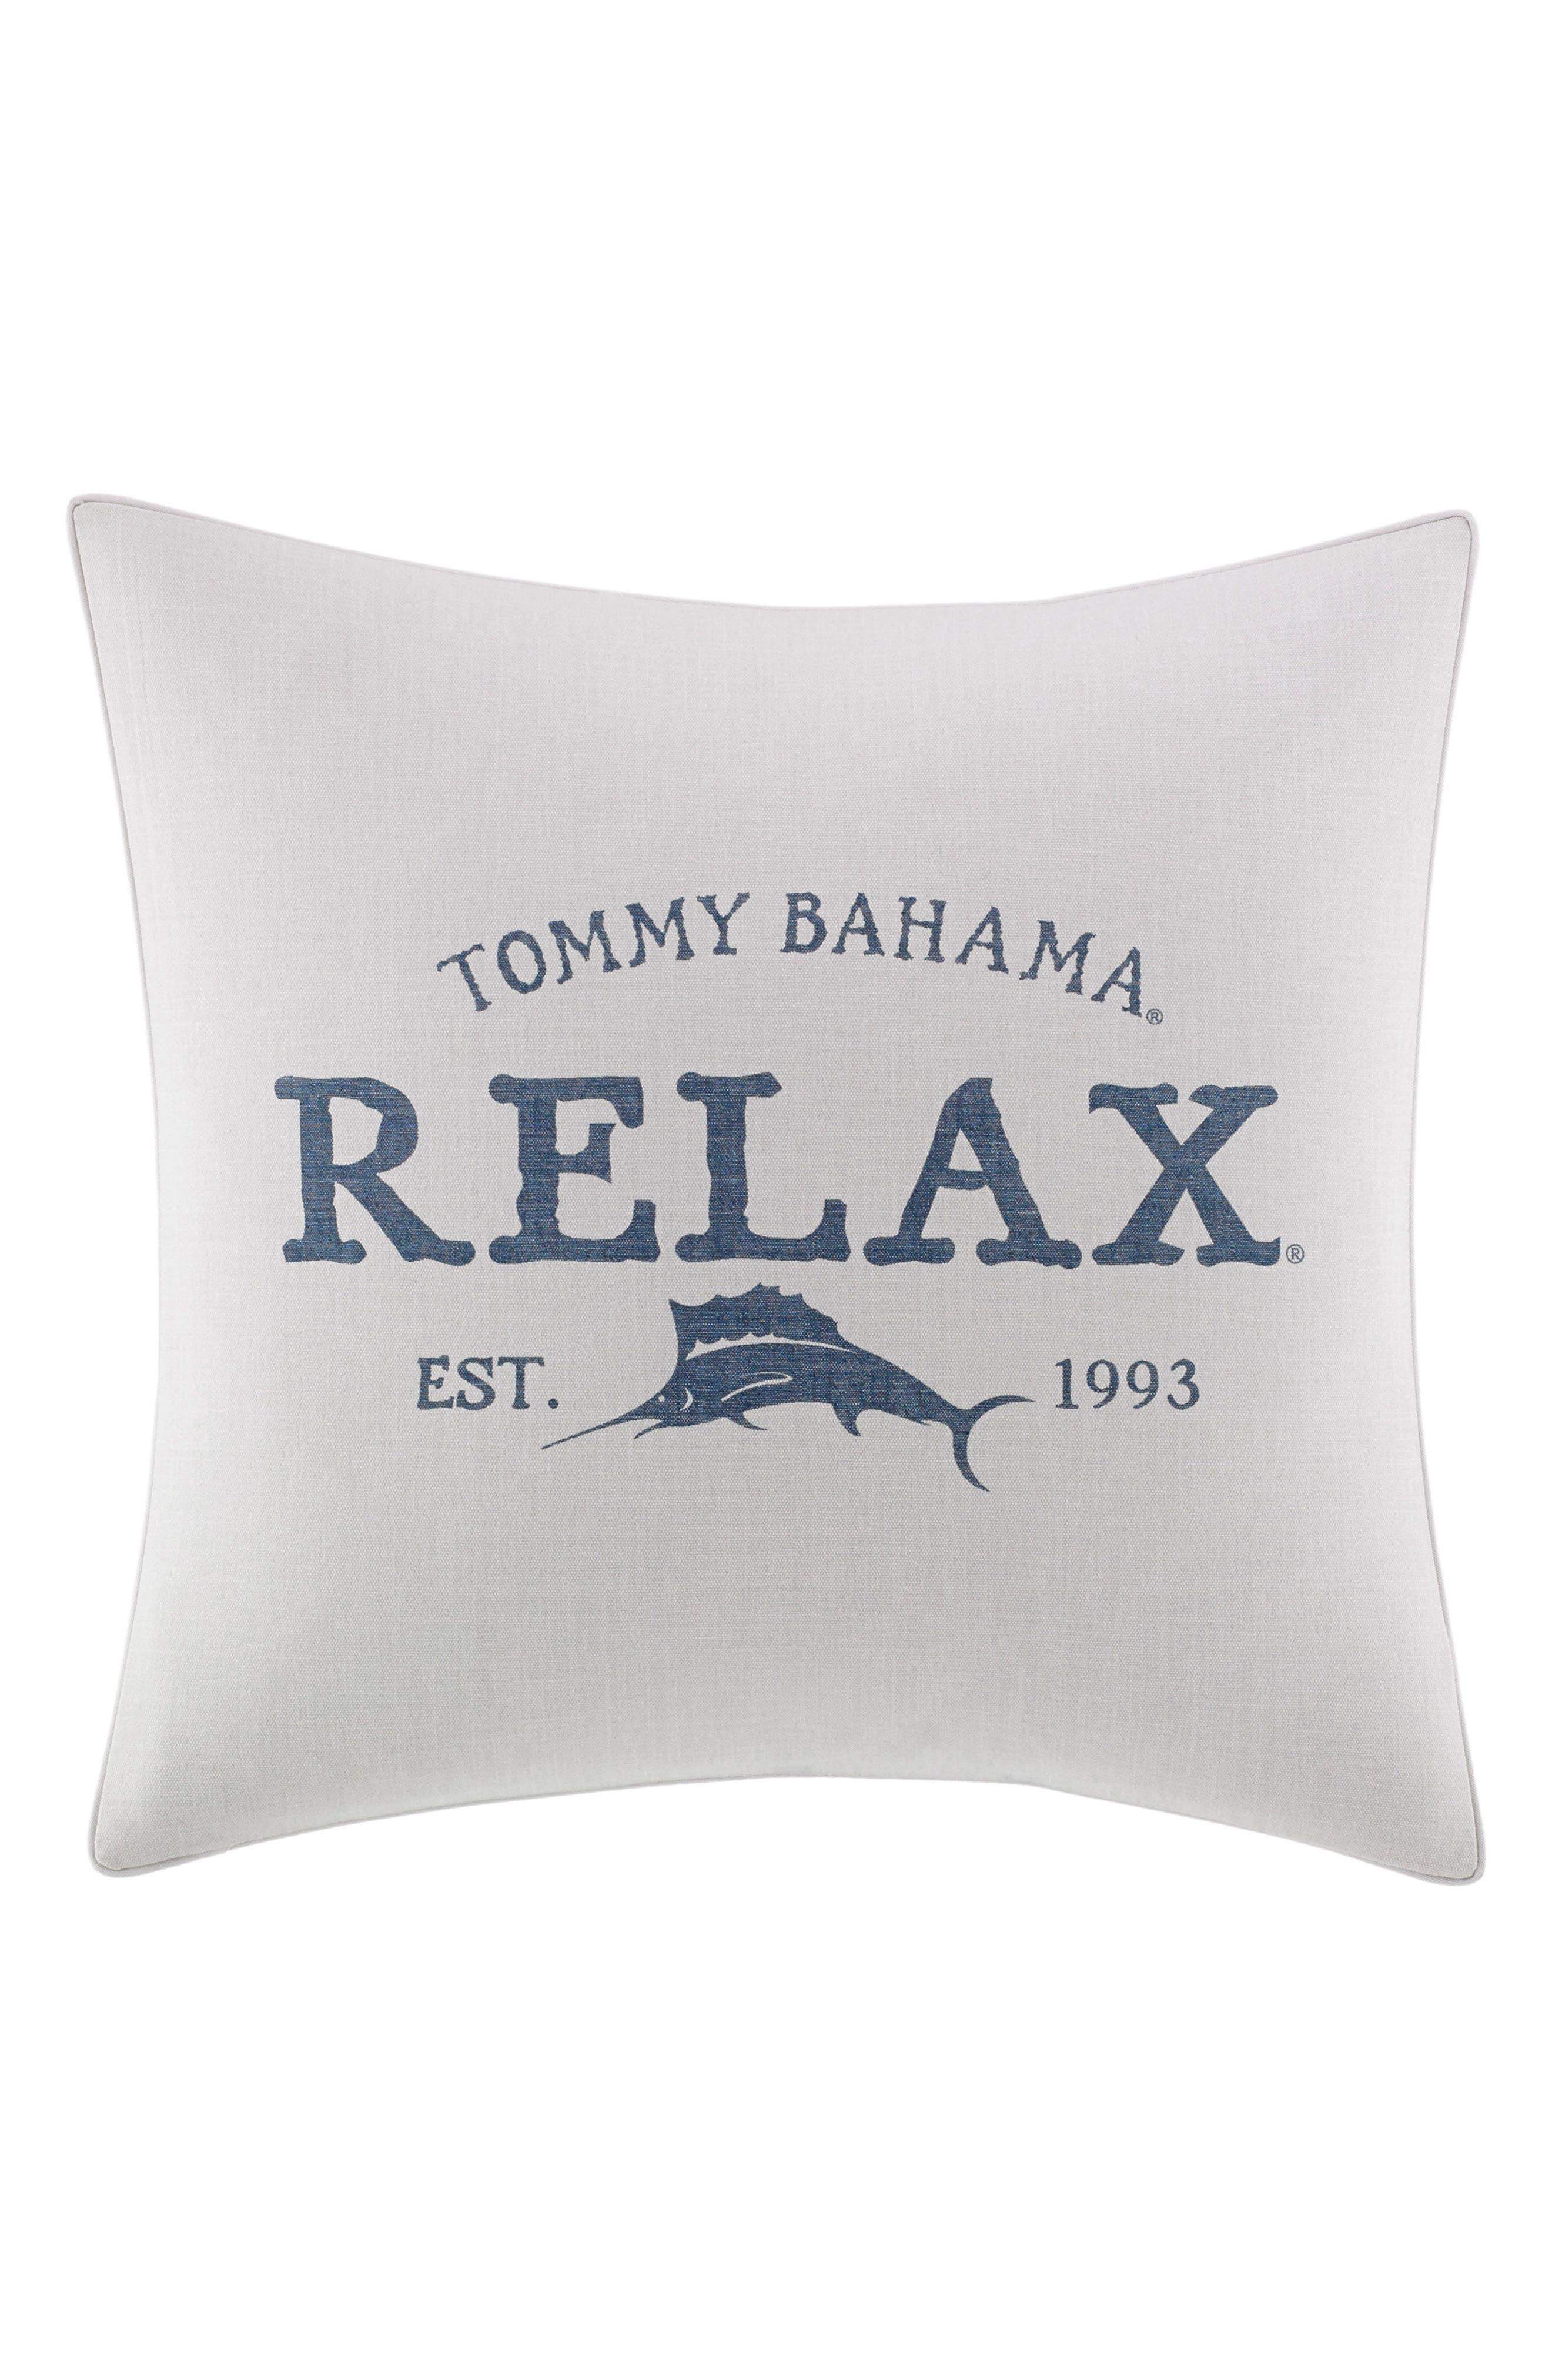 Tommy Bahama Raw Coast Relax Pillow